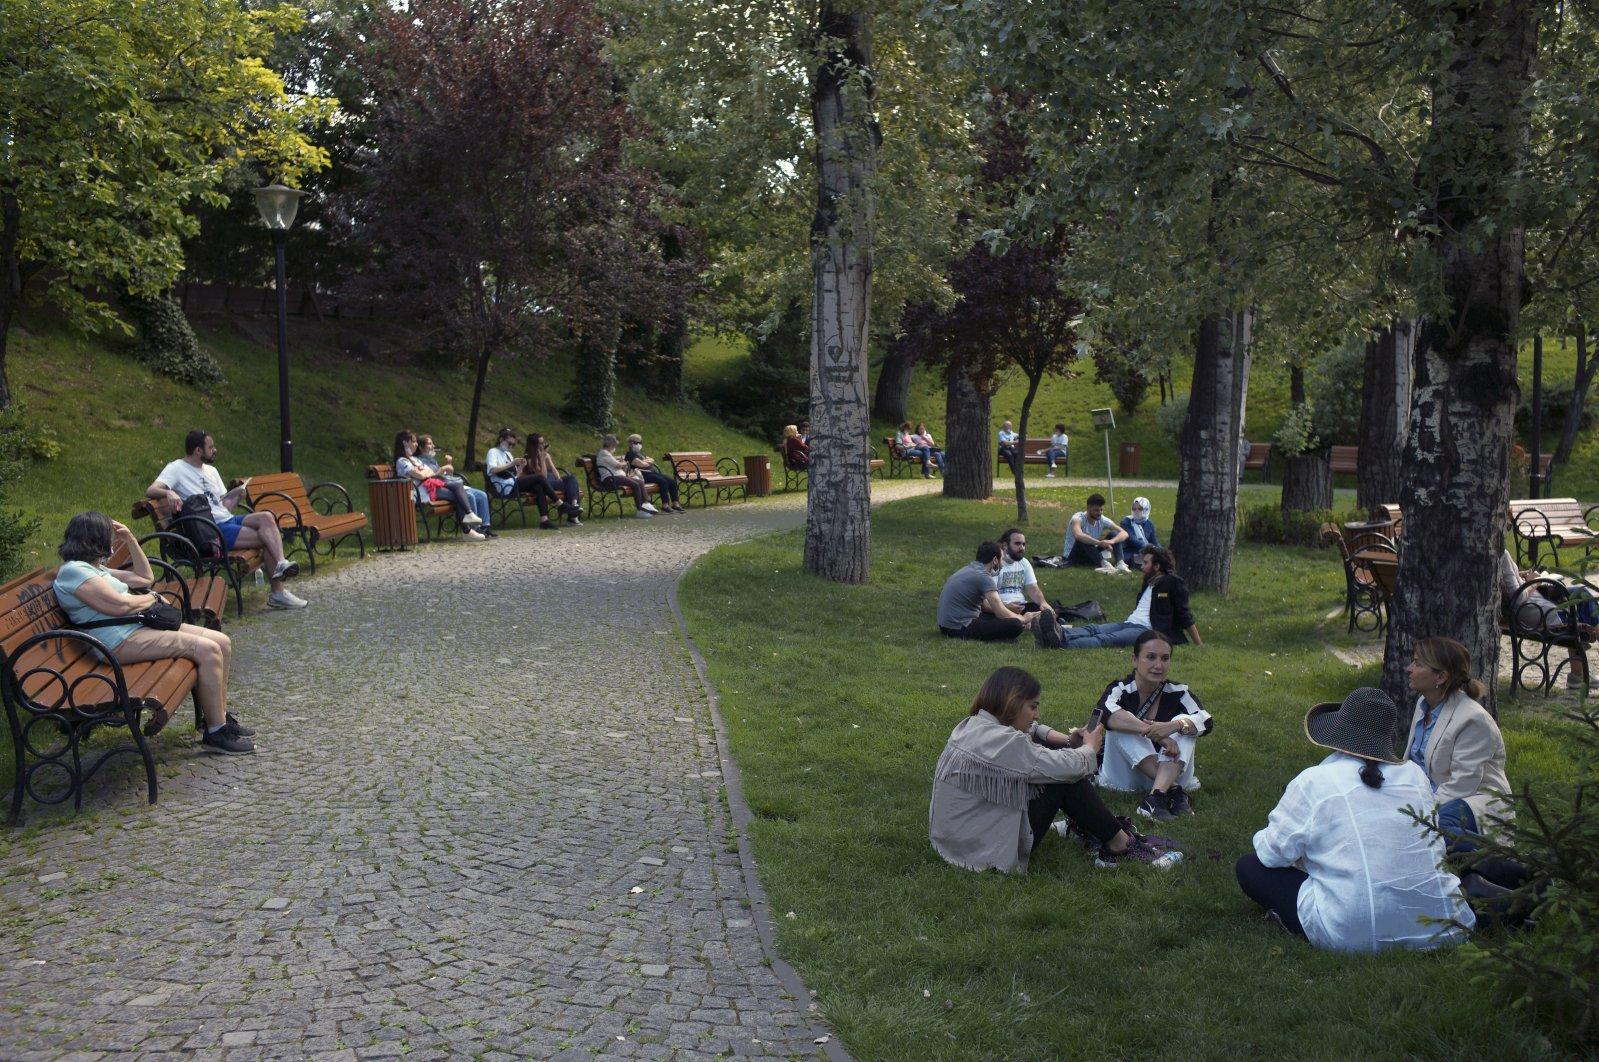 Maskless people sit in a public garden, despite a mandatory rule requiring face masks to be worn, in Ankara, Turkey, June 24, 2020. (AP Photo)